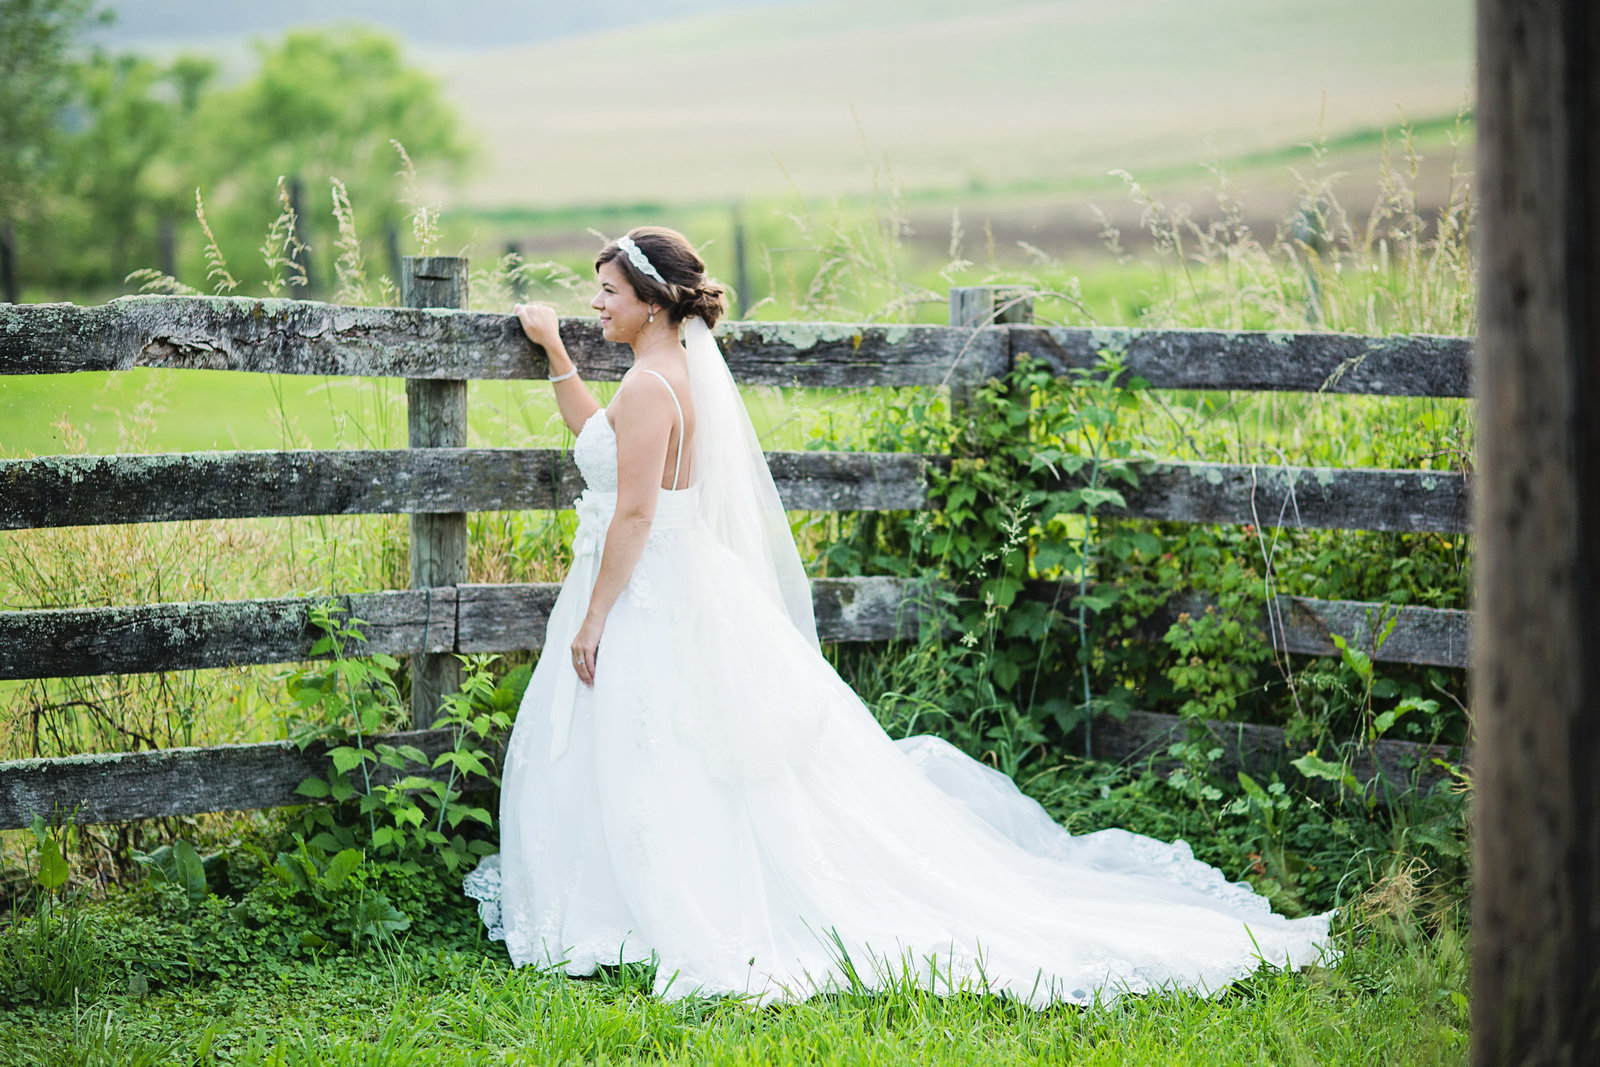 bridal portrait skyryder engagement wedding photography blacksburg roanoke charlottesville lexington radford-001